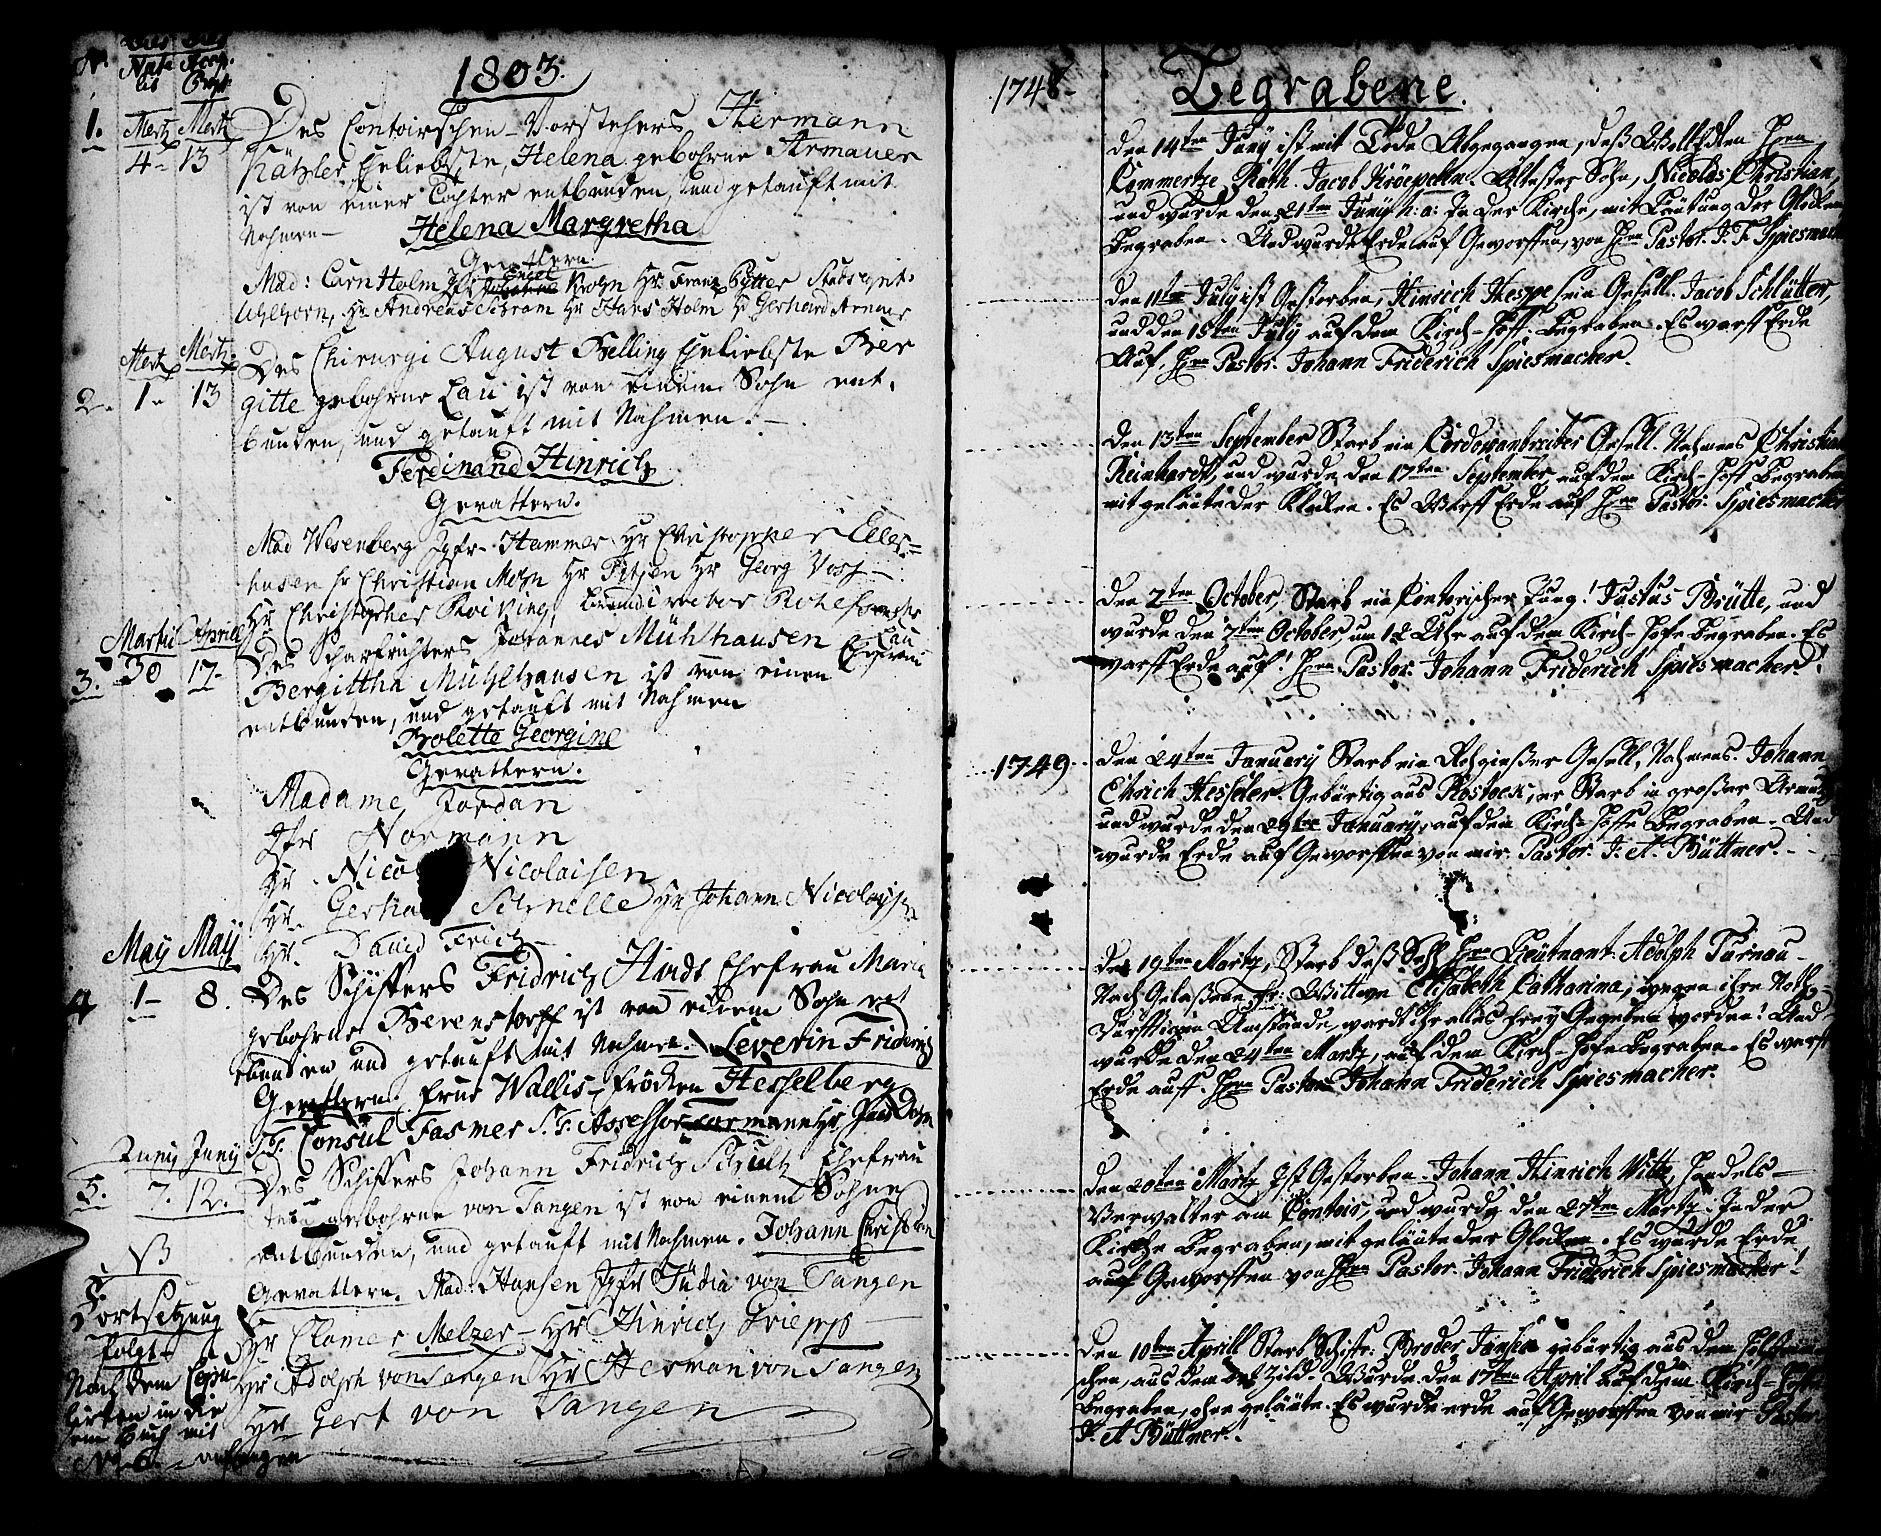 SAB, Mariakirken Sokneprestembete, H/Haa/L0002: Ministerialbok nr. A 2, 1748-1807, s. 96